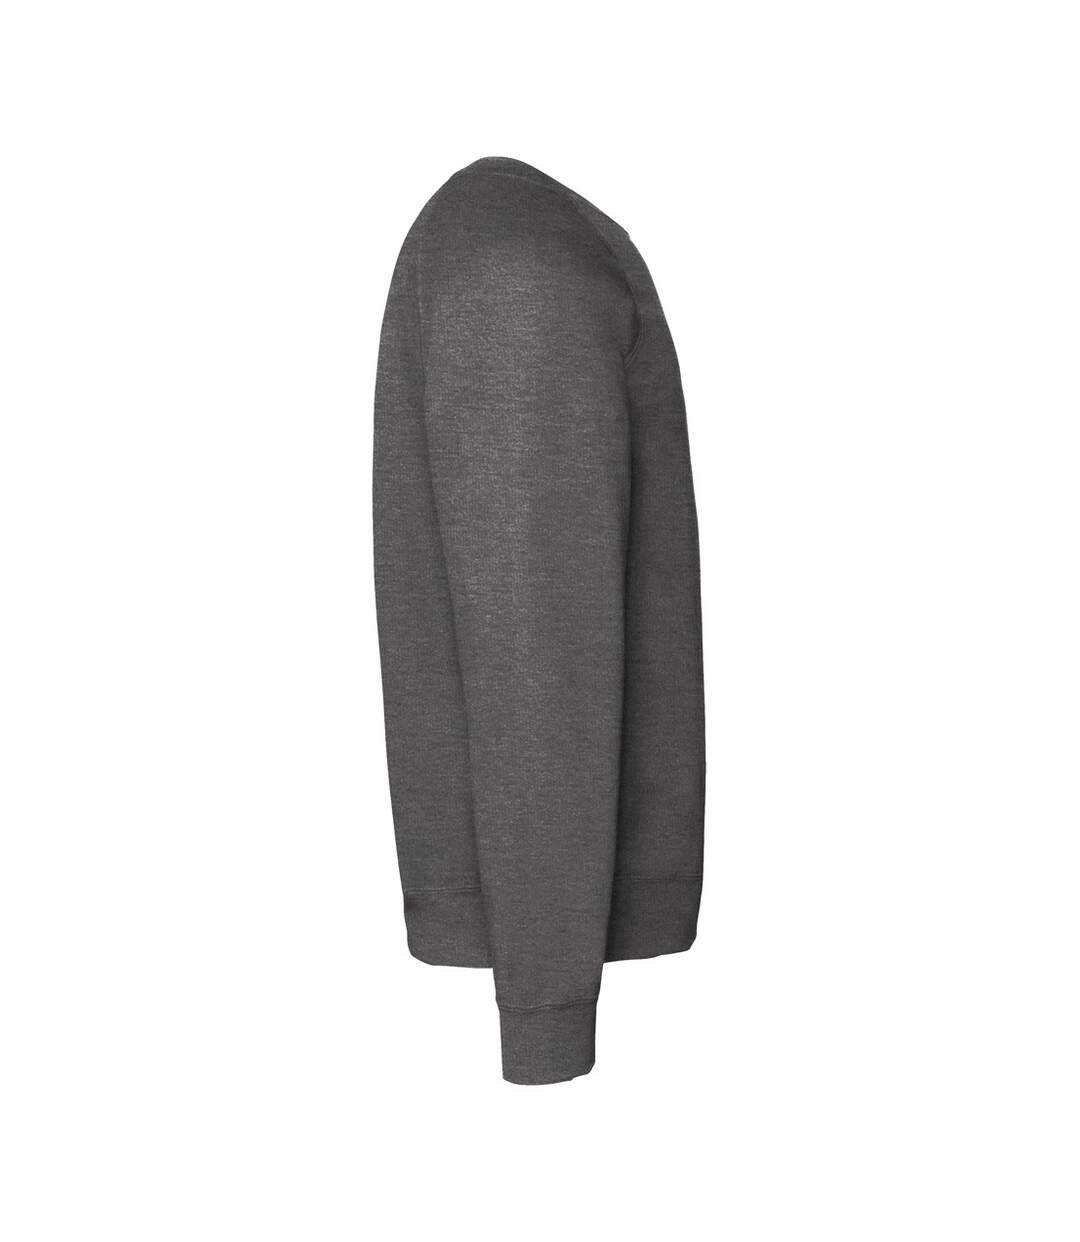 Fruit Of The Loom Mens Raglan Sleeve Belcoro® Sweatshirt (Dark Heather) - UTBC368